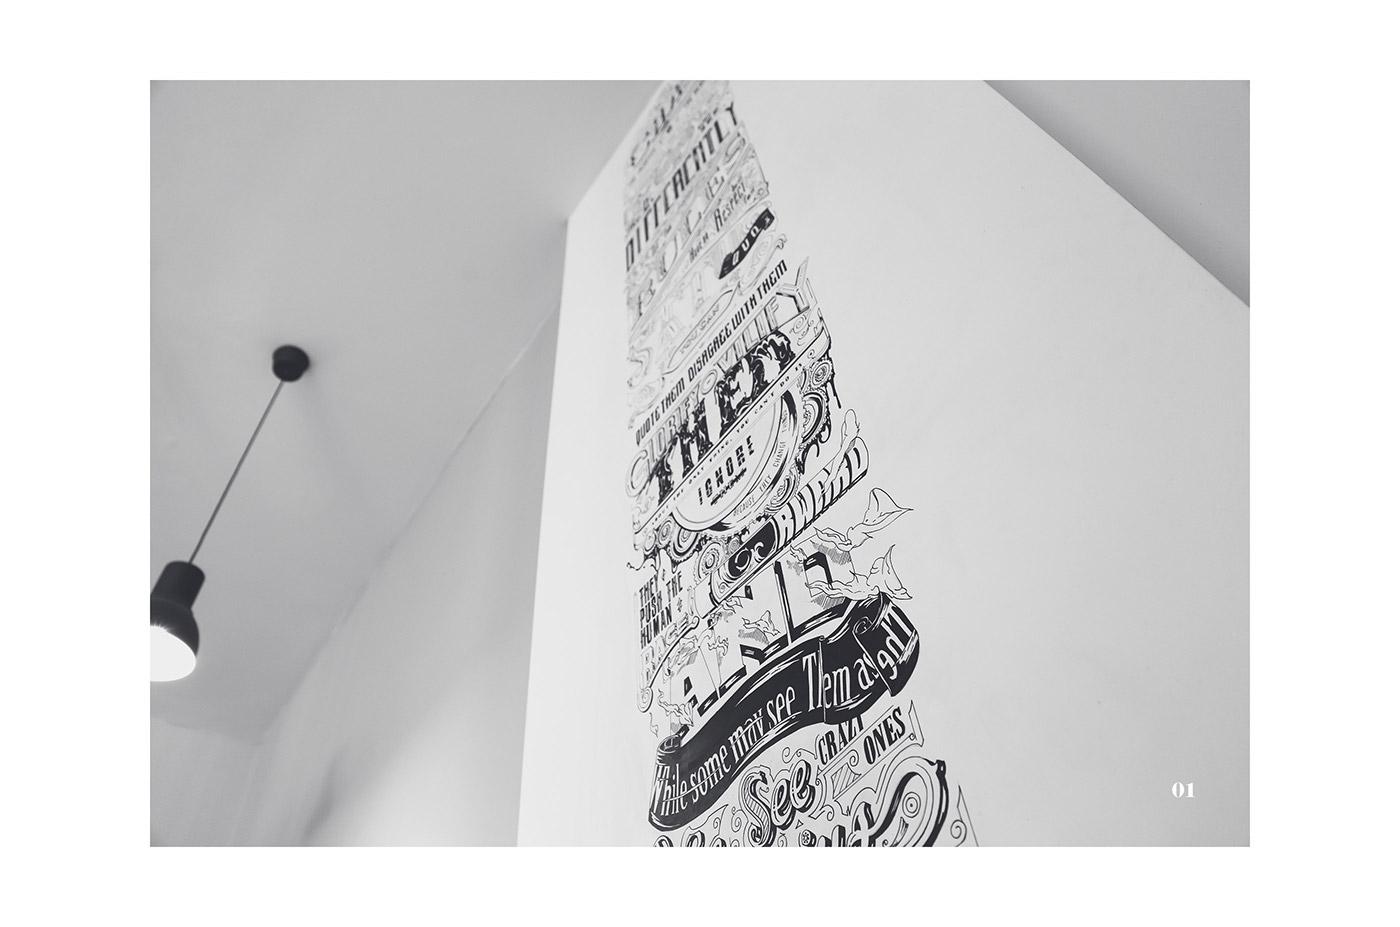 steve Jobs tribute typography   wall paint apple typo